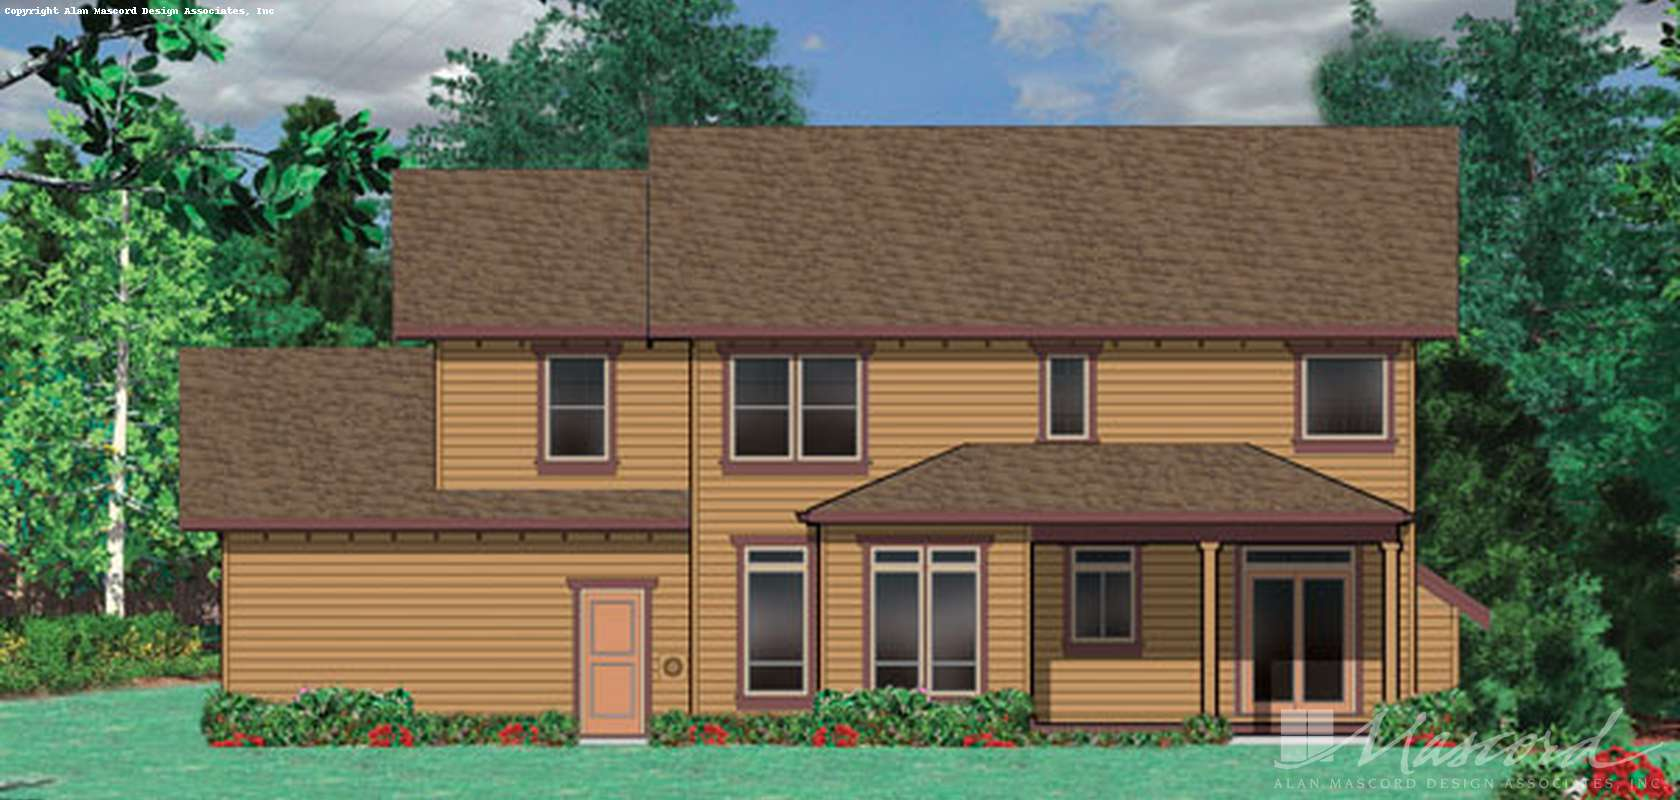 Mascord House Plan 22130: The Sorel